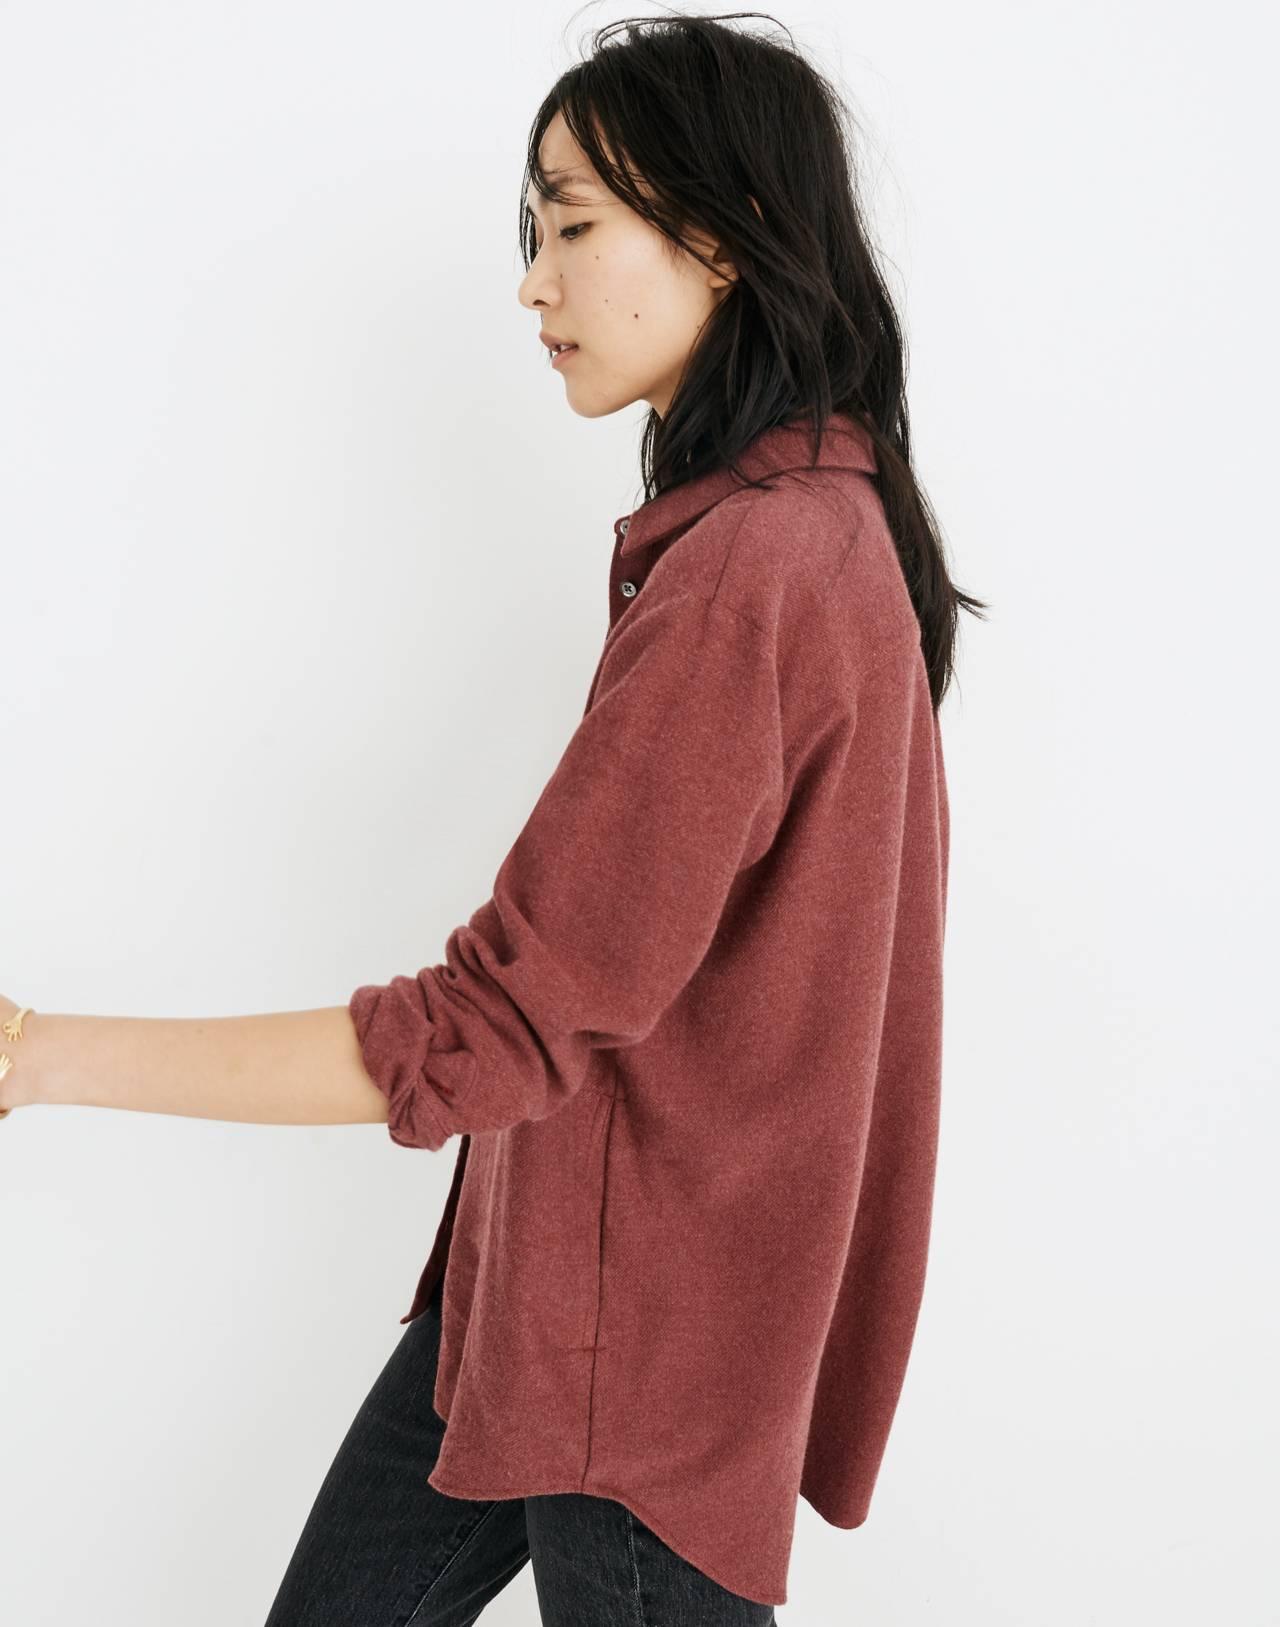 Flannel Sunday Shirt in light burgundy image 2